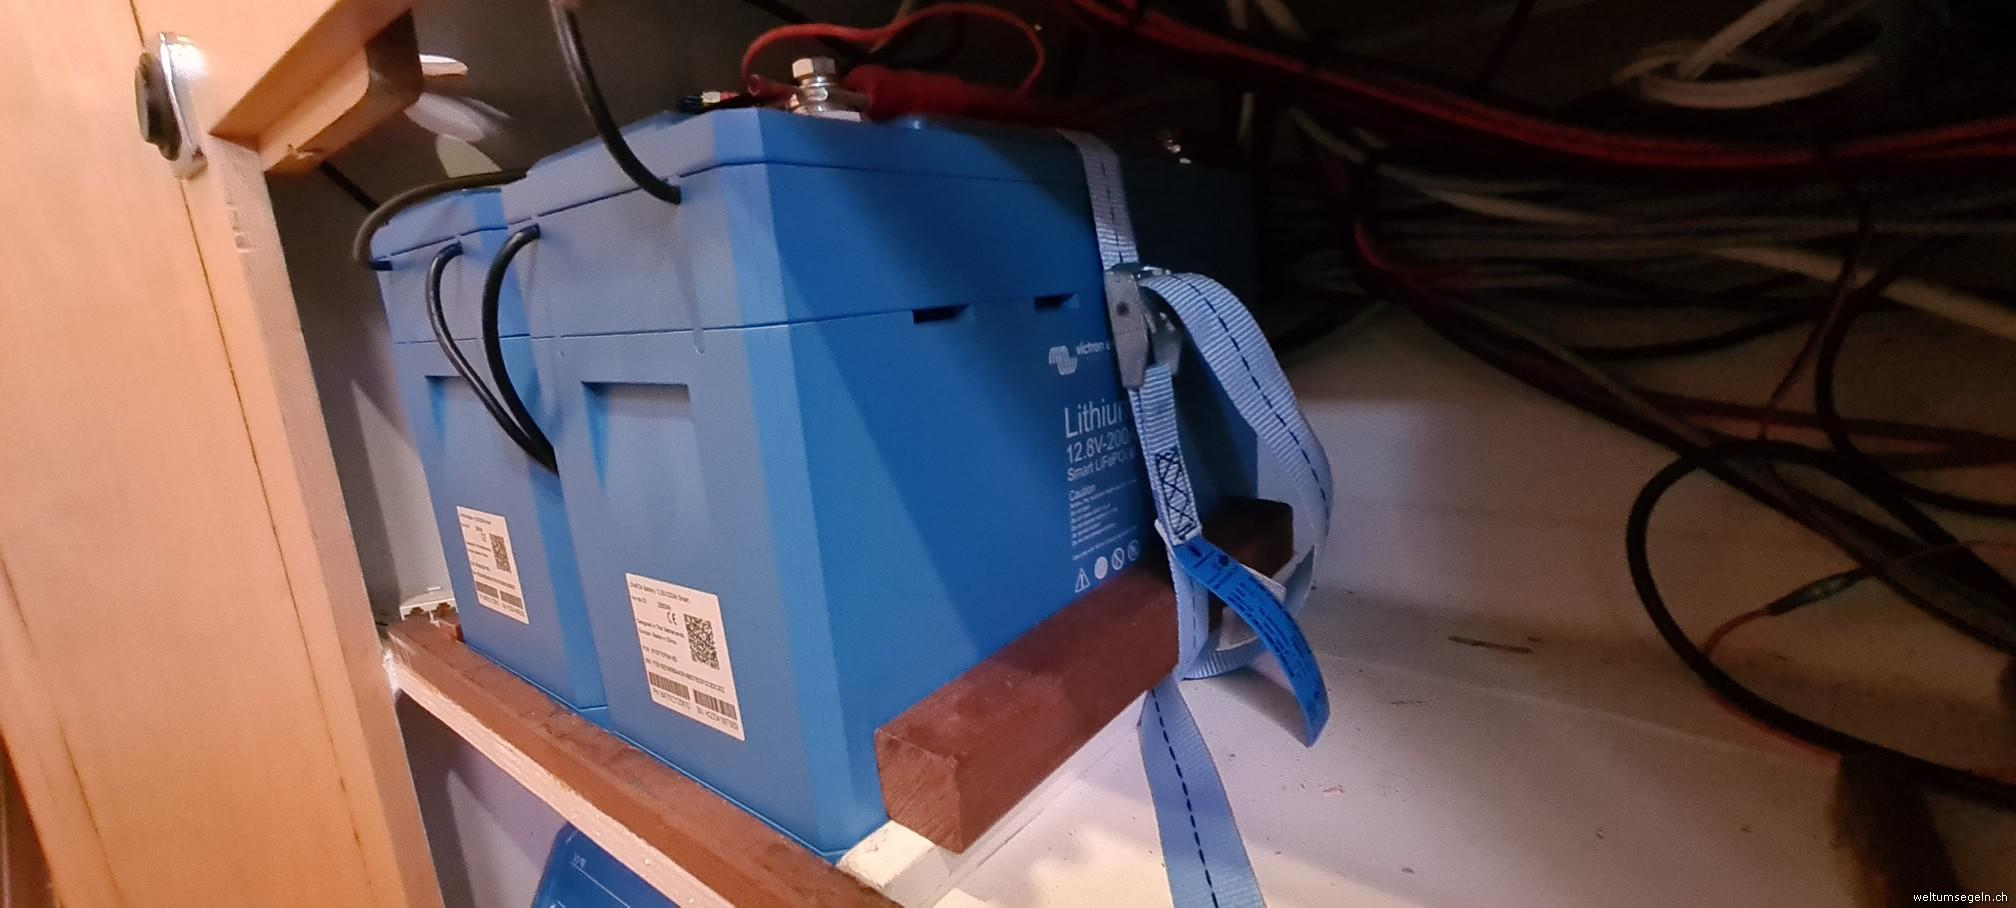 Lithium Batterien LiFePO4